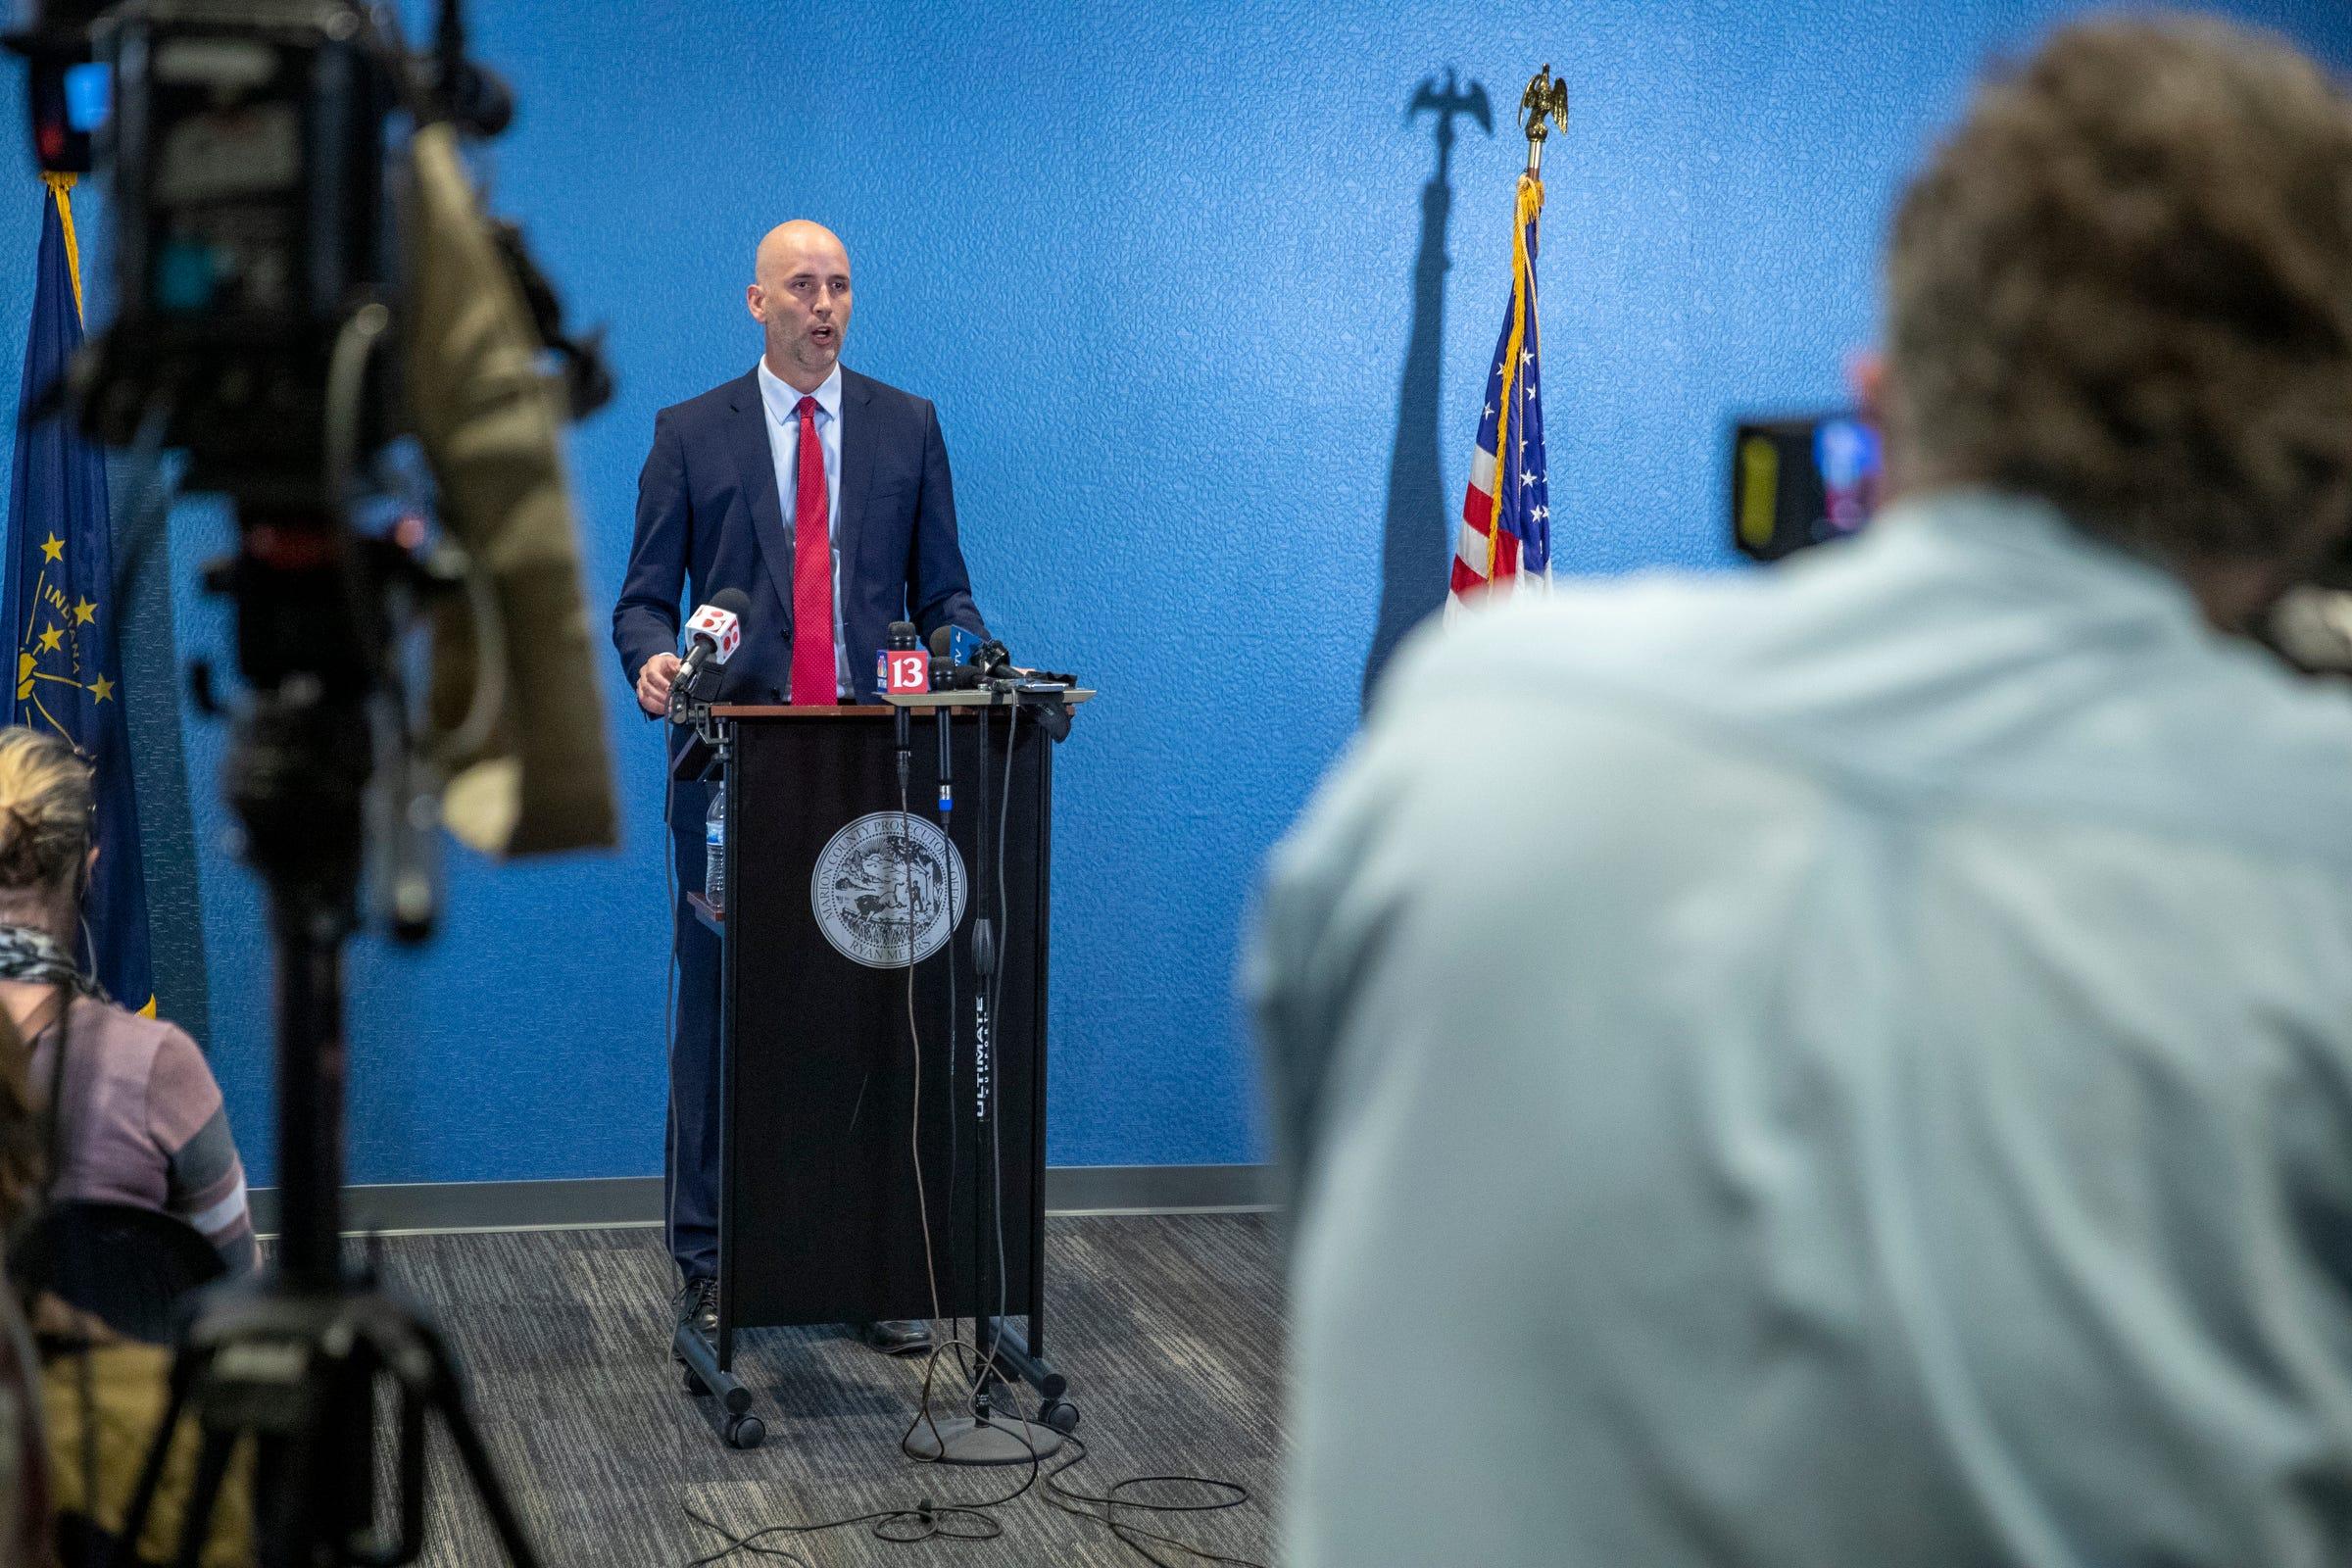 Prosecutor Ryan Mears discusses the FedEx shooting, Brandon Scott Hole